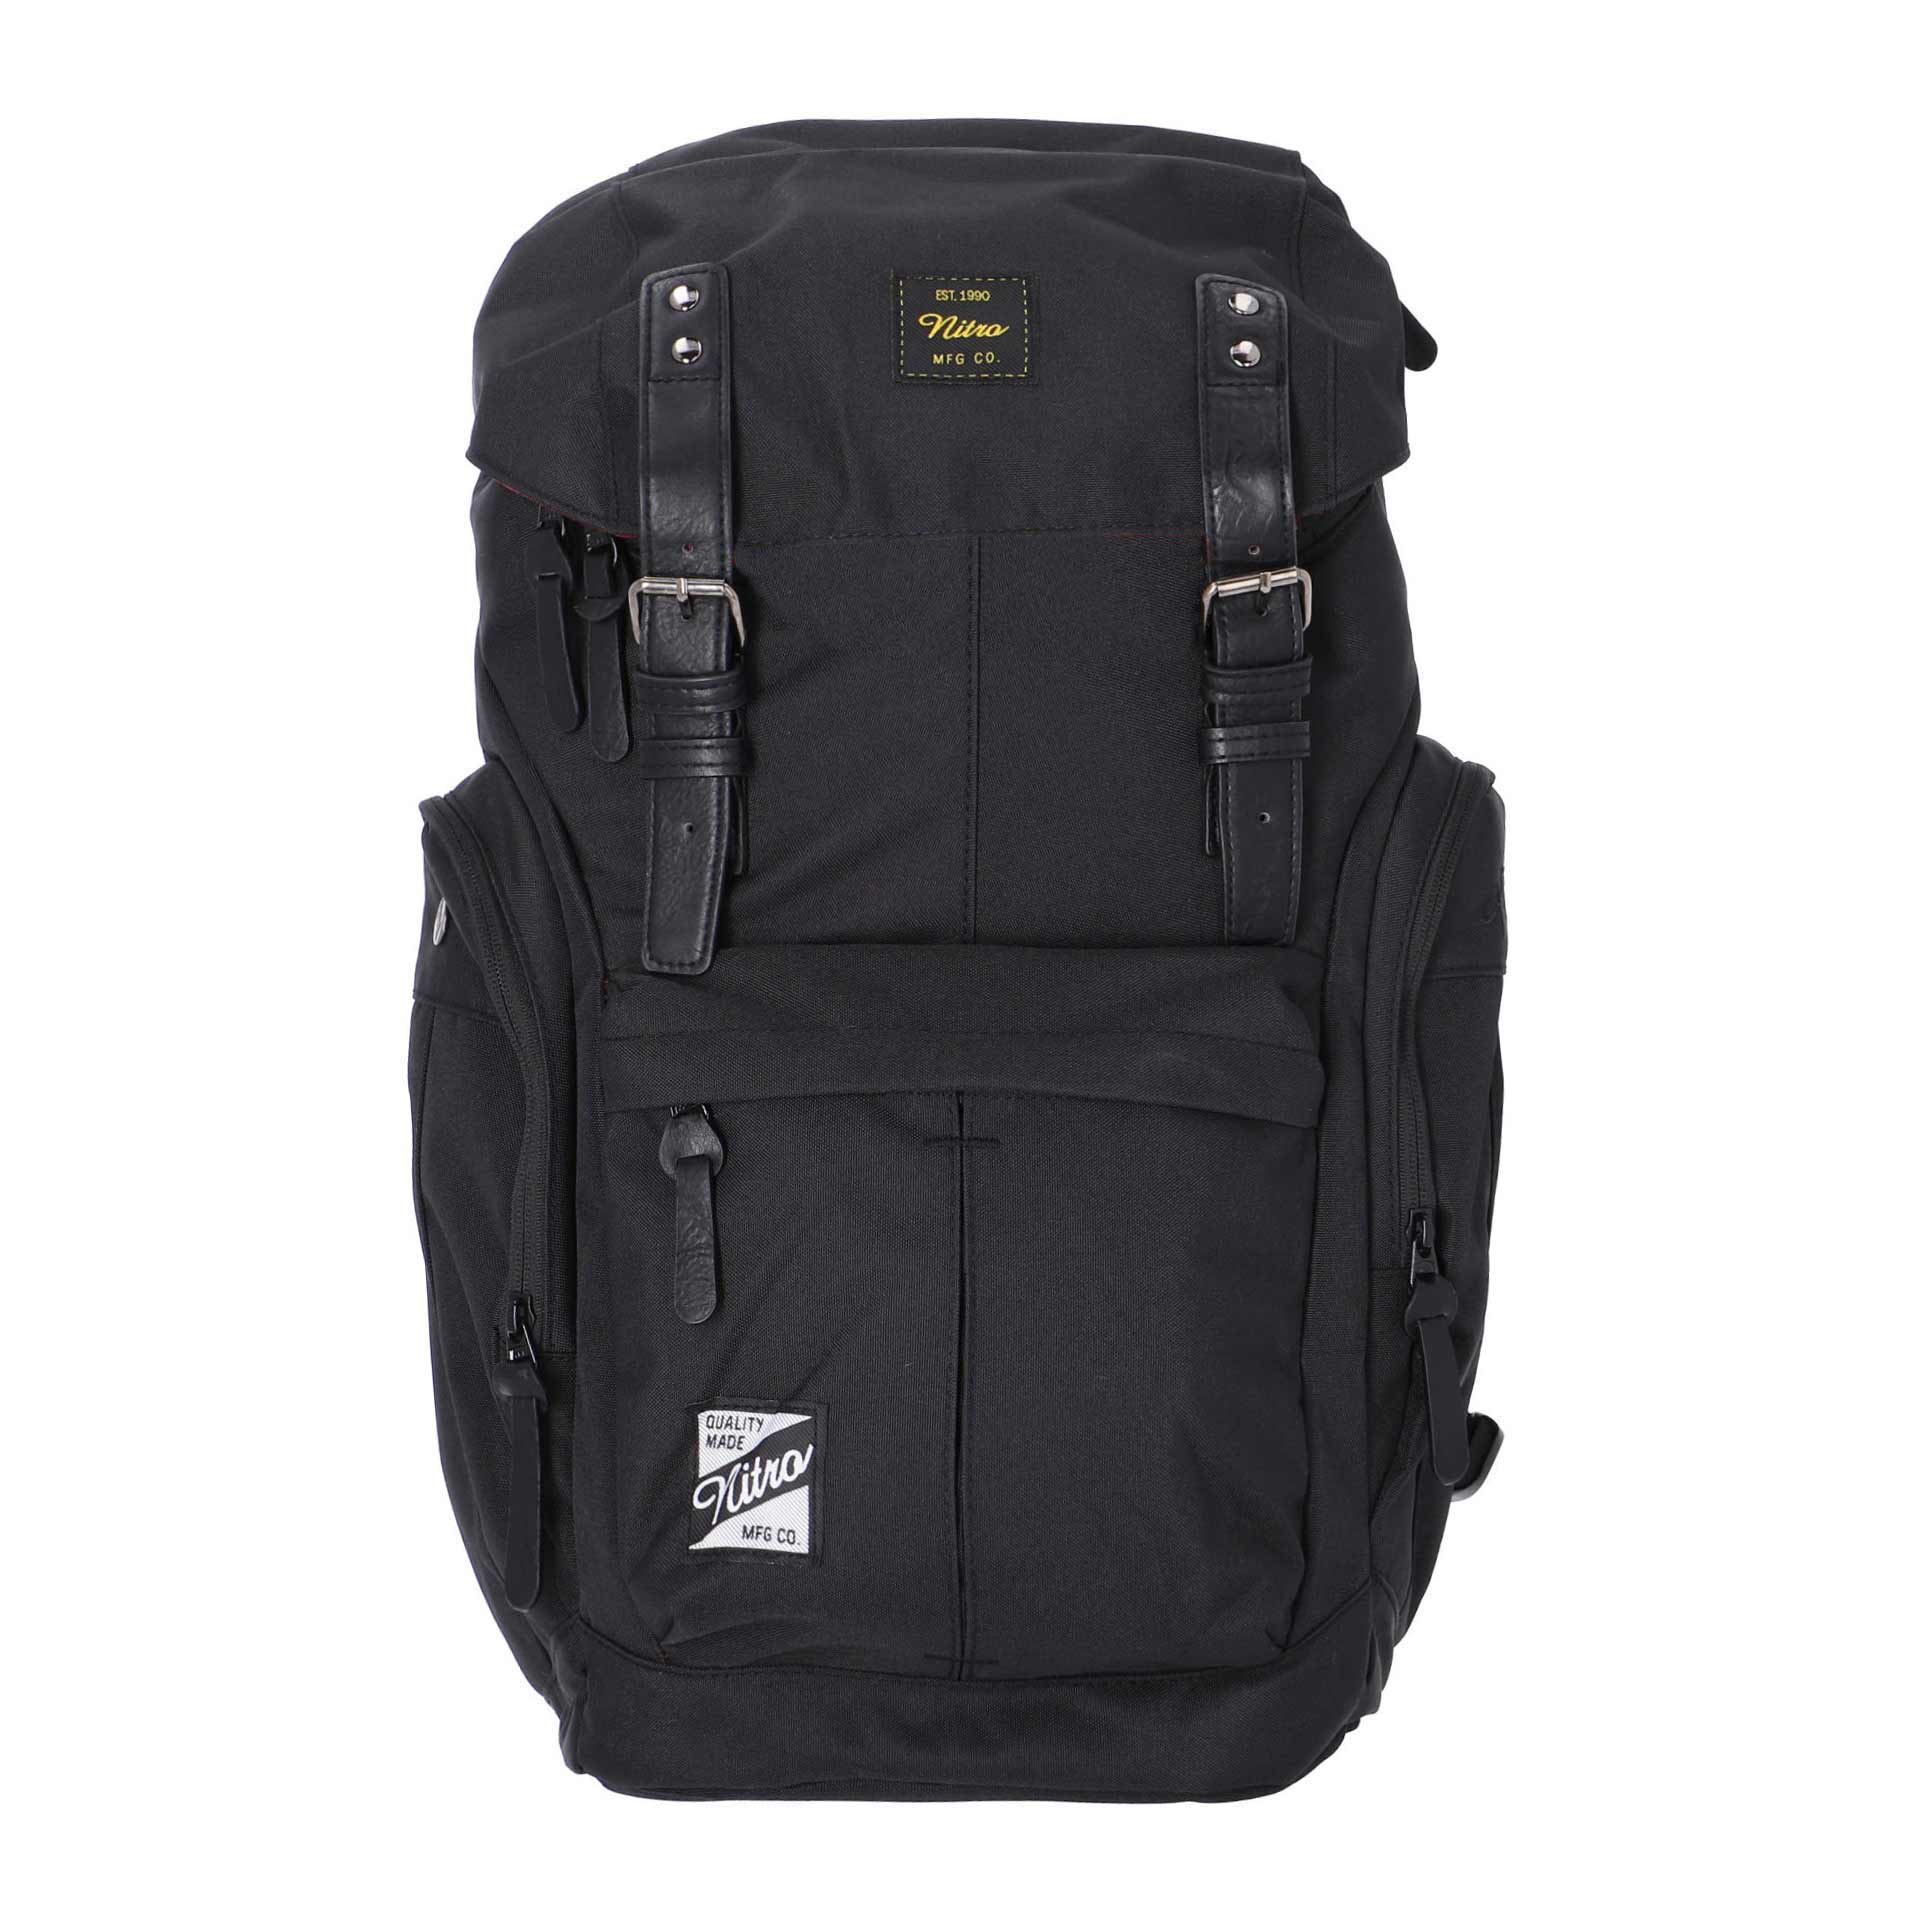 Nitro Daypacker Rucksack true black